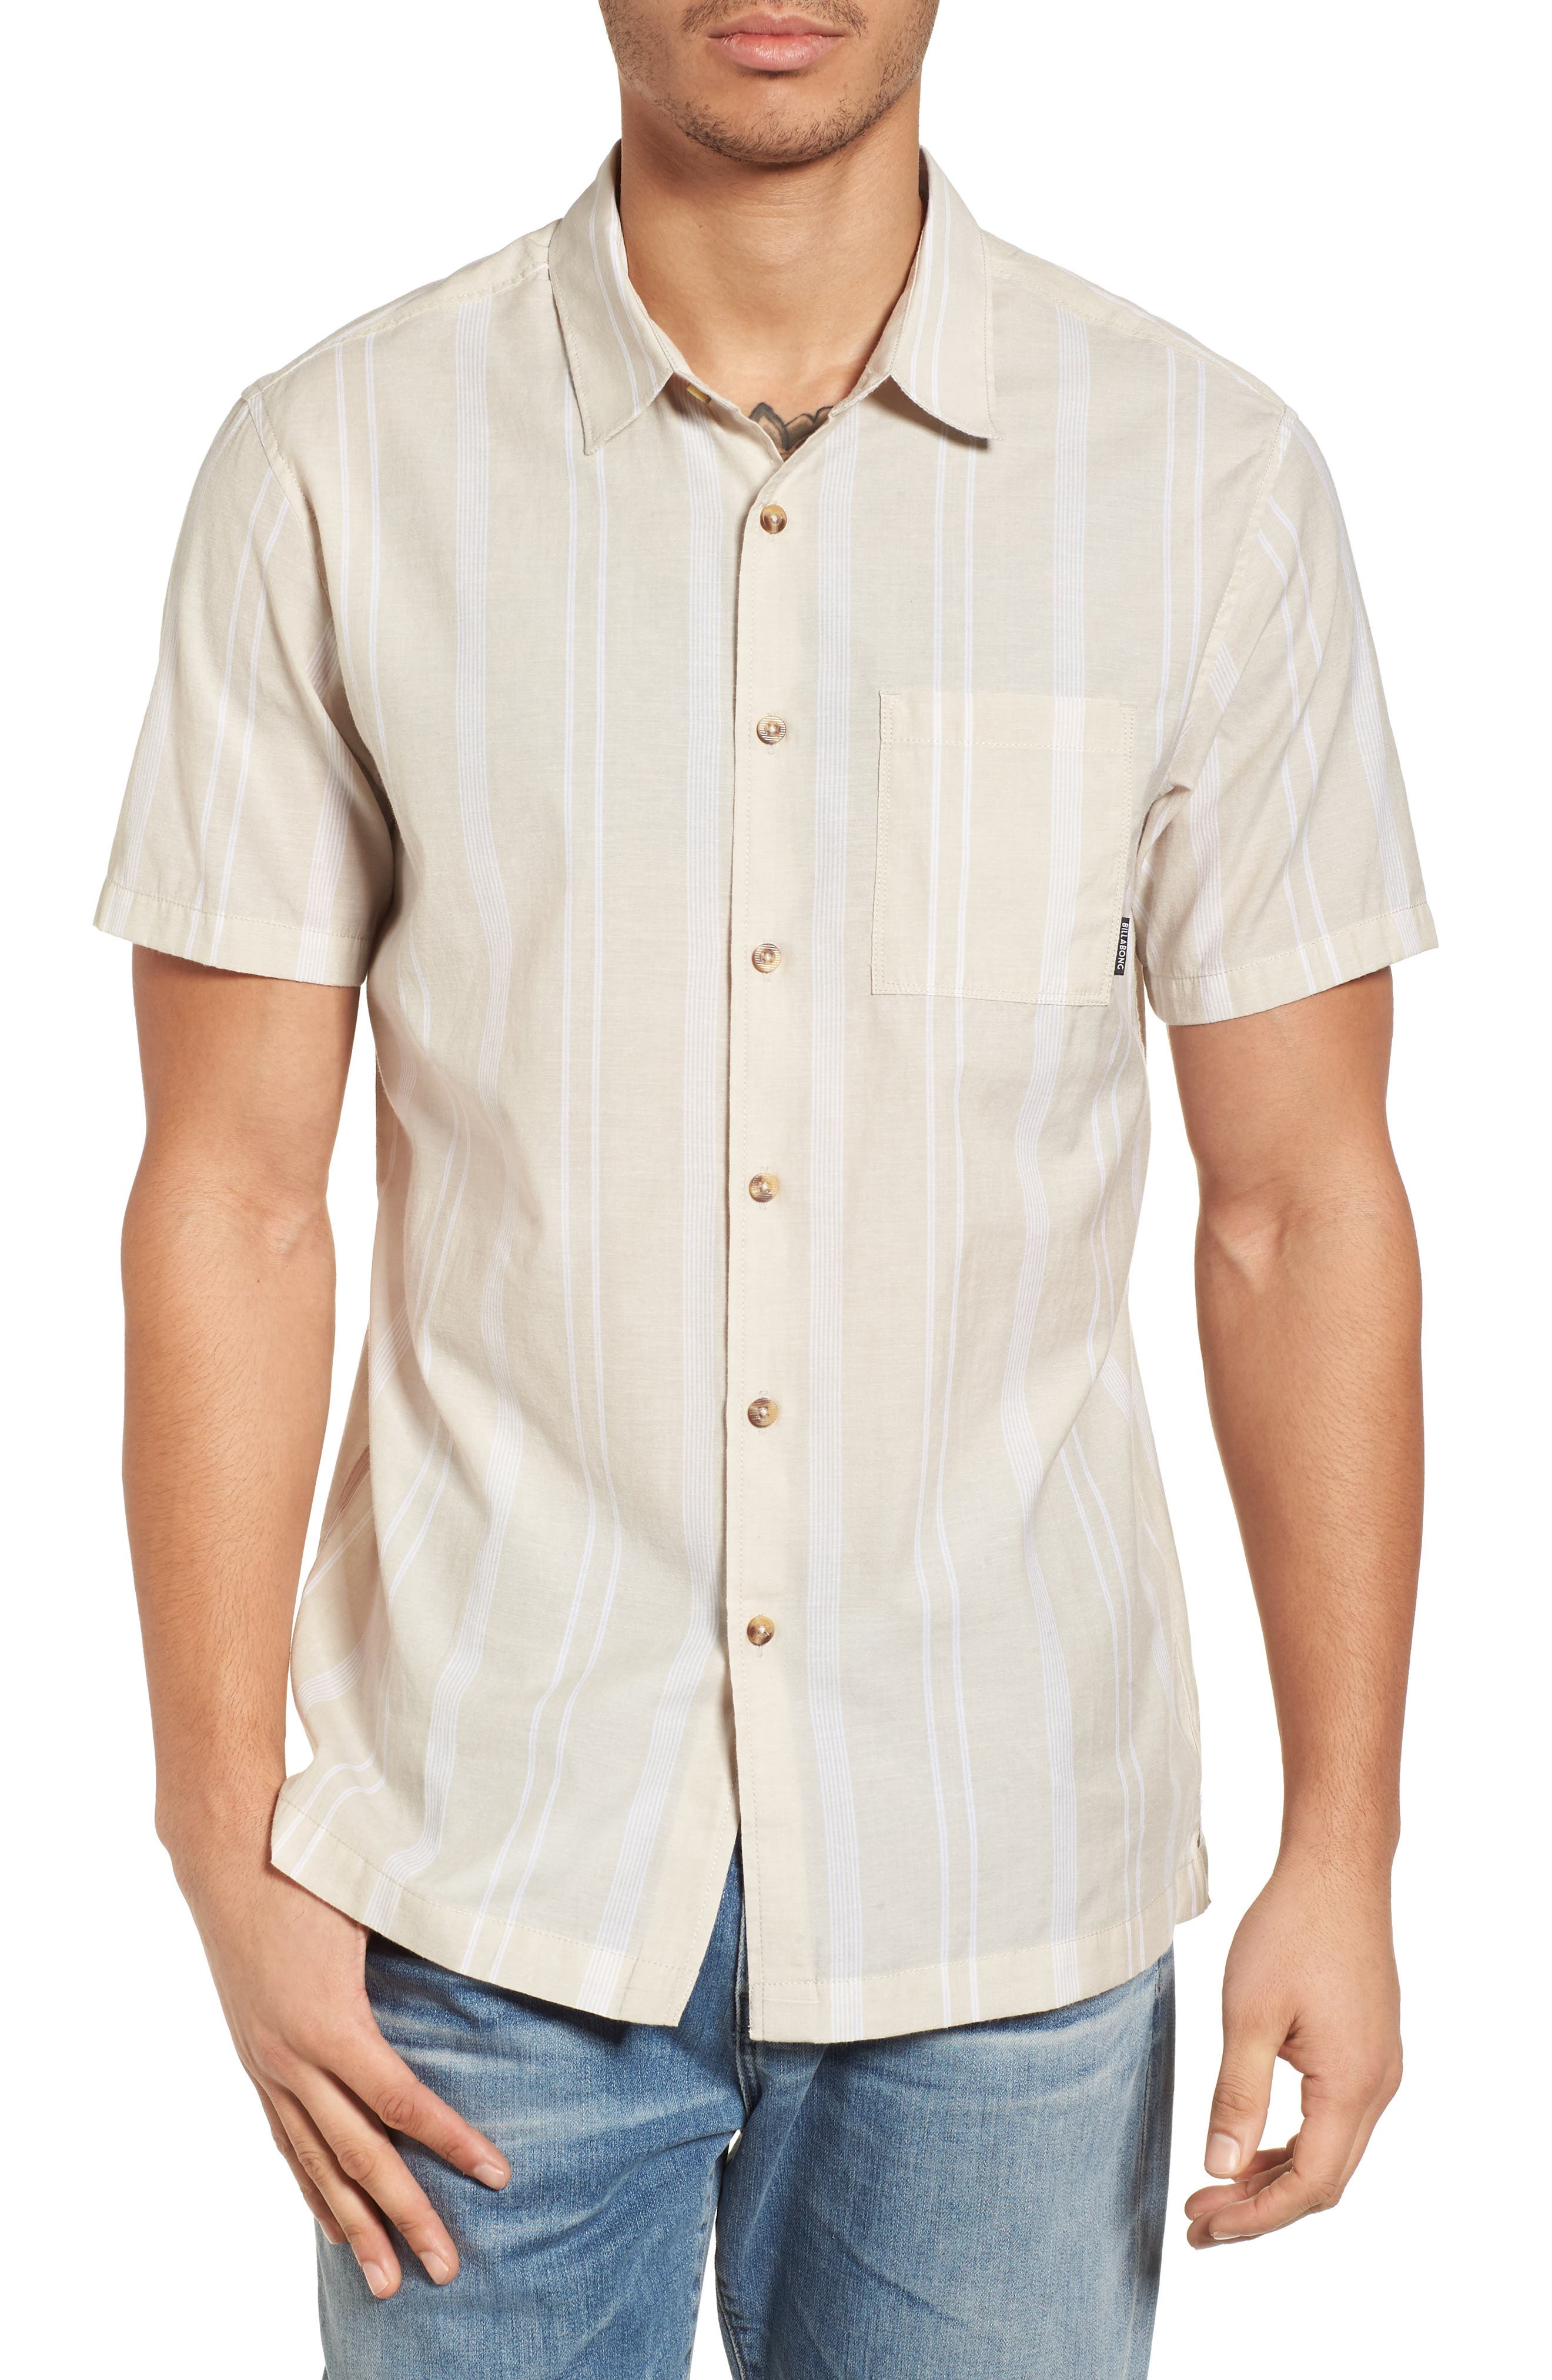 Donny Short Sleeve Shirt,                         Main,                         color, Sand